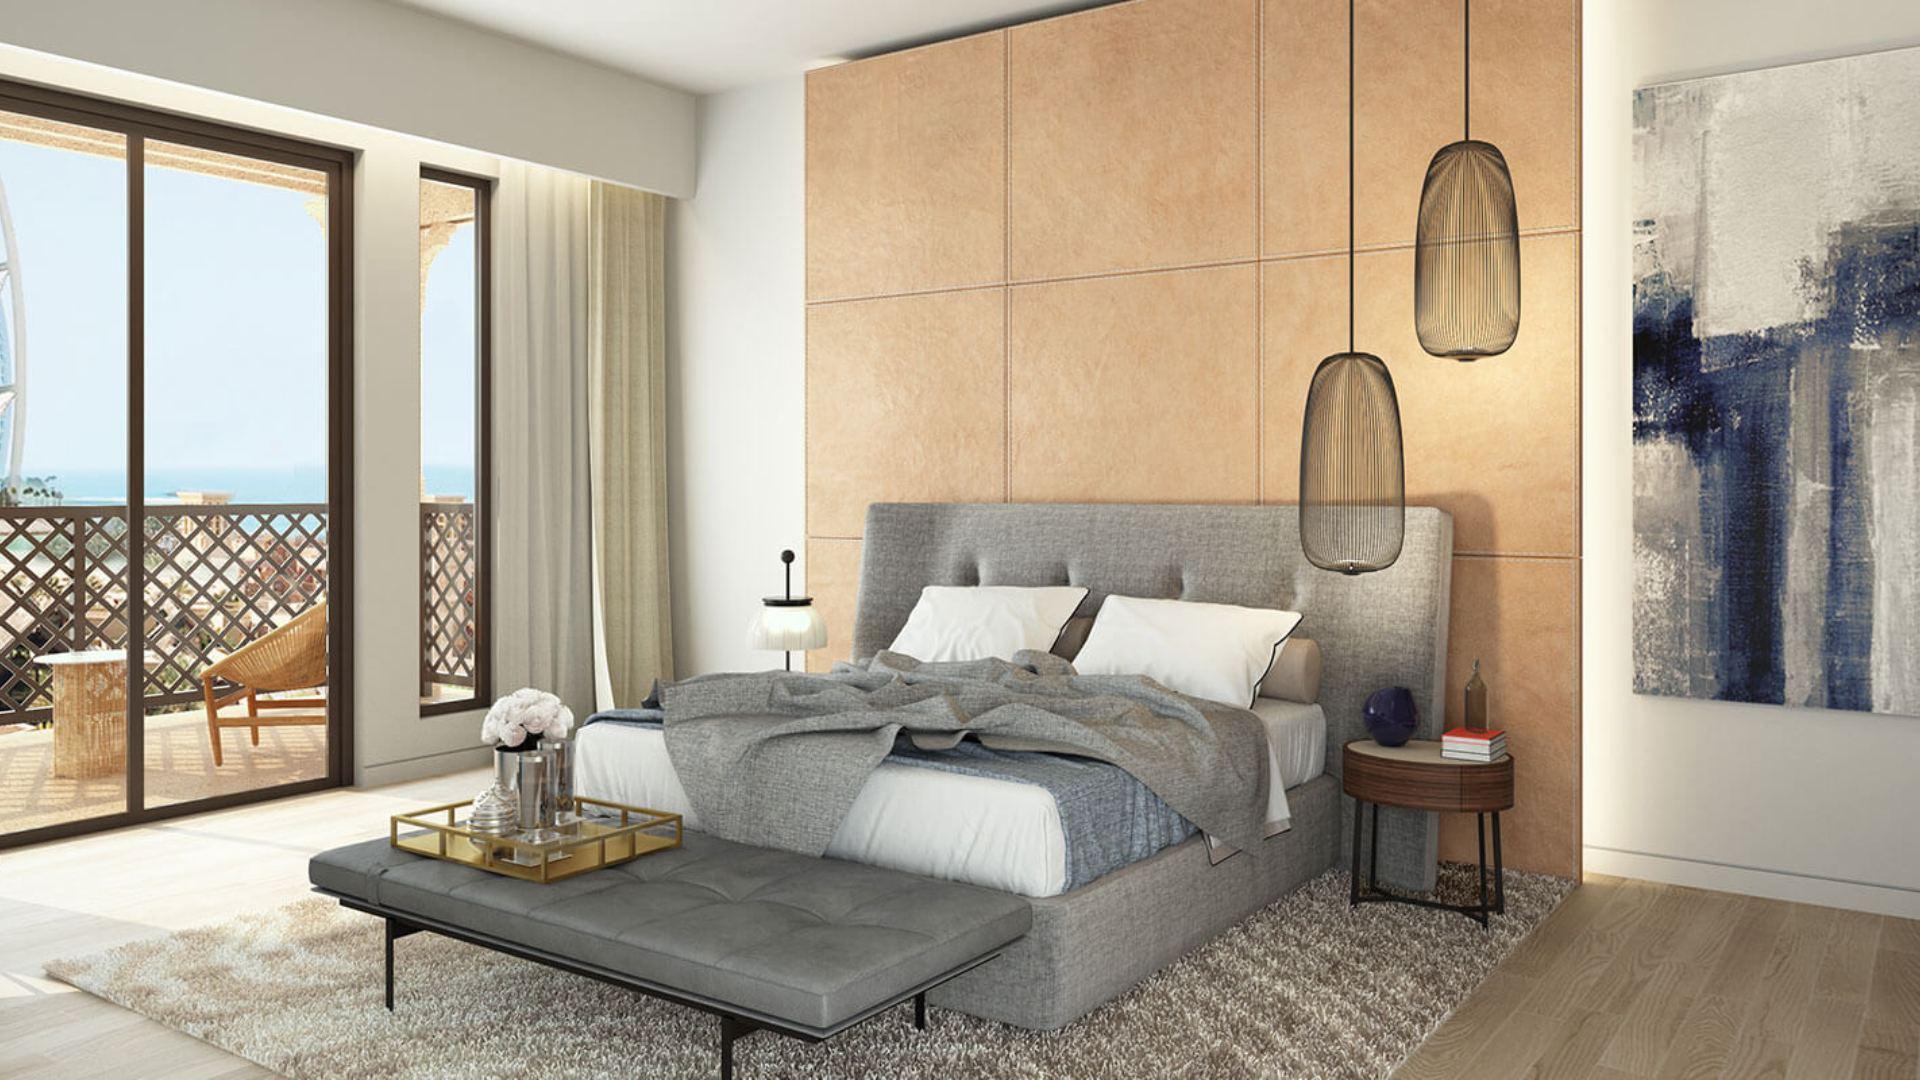 Penthouse for sale in Dubai, UAE, 4 bedrooms, 317 m2, No. 24296 – photo 1